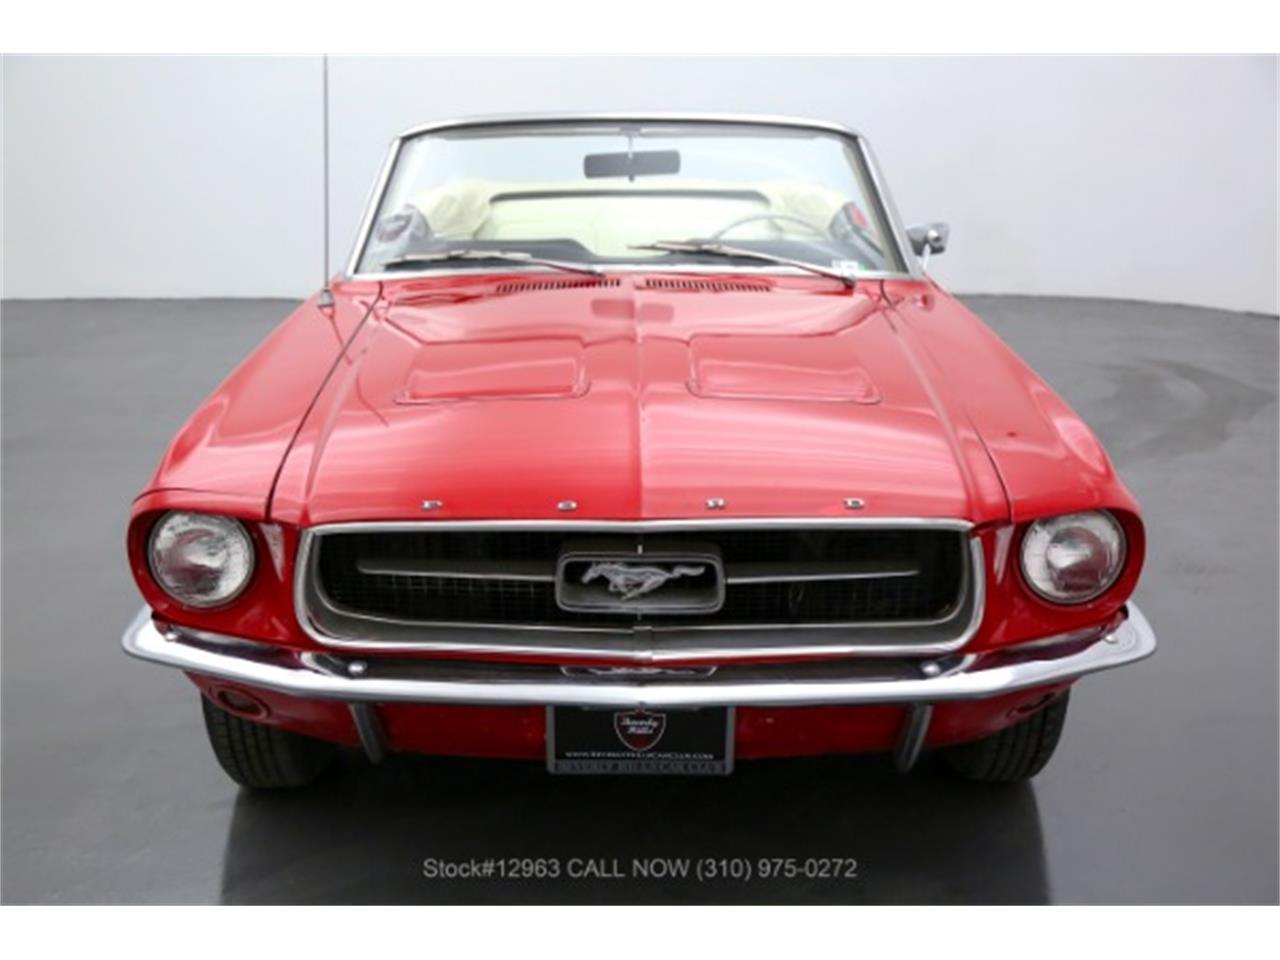 Ford Mustang V8 289 1967 prix tout compris 1967